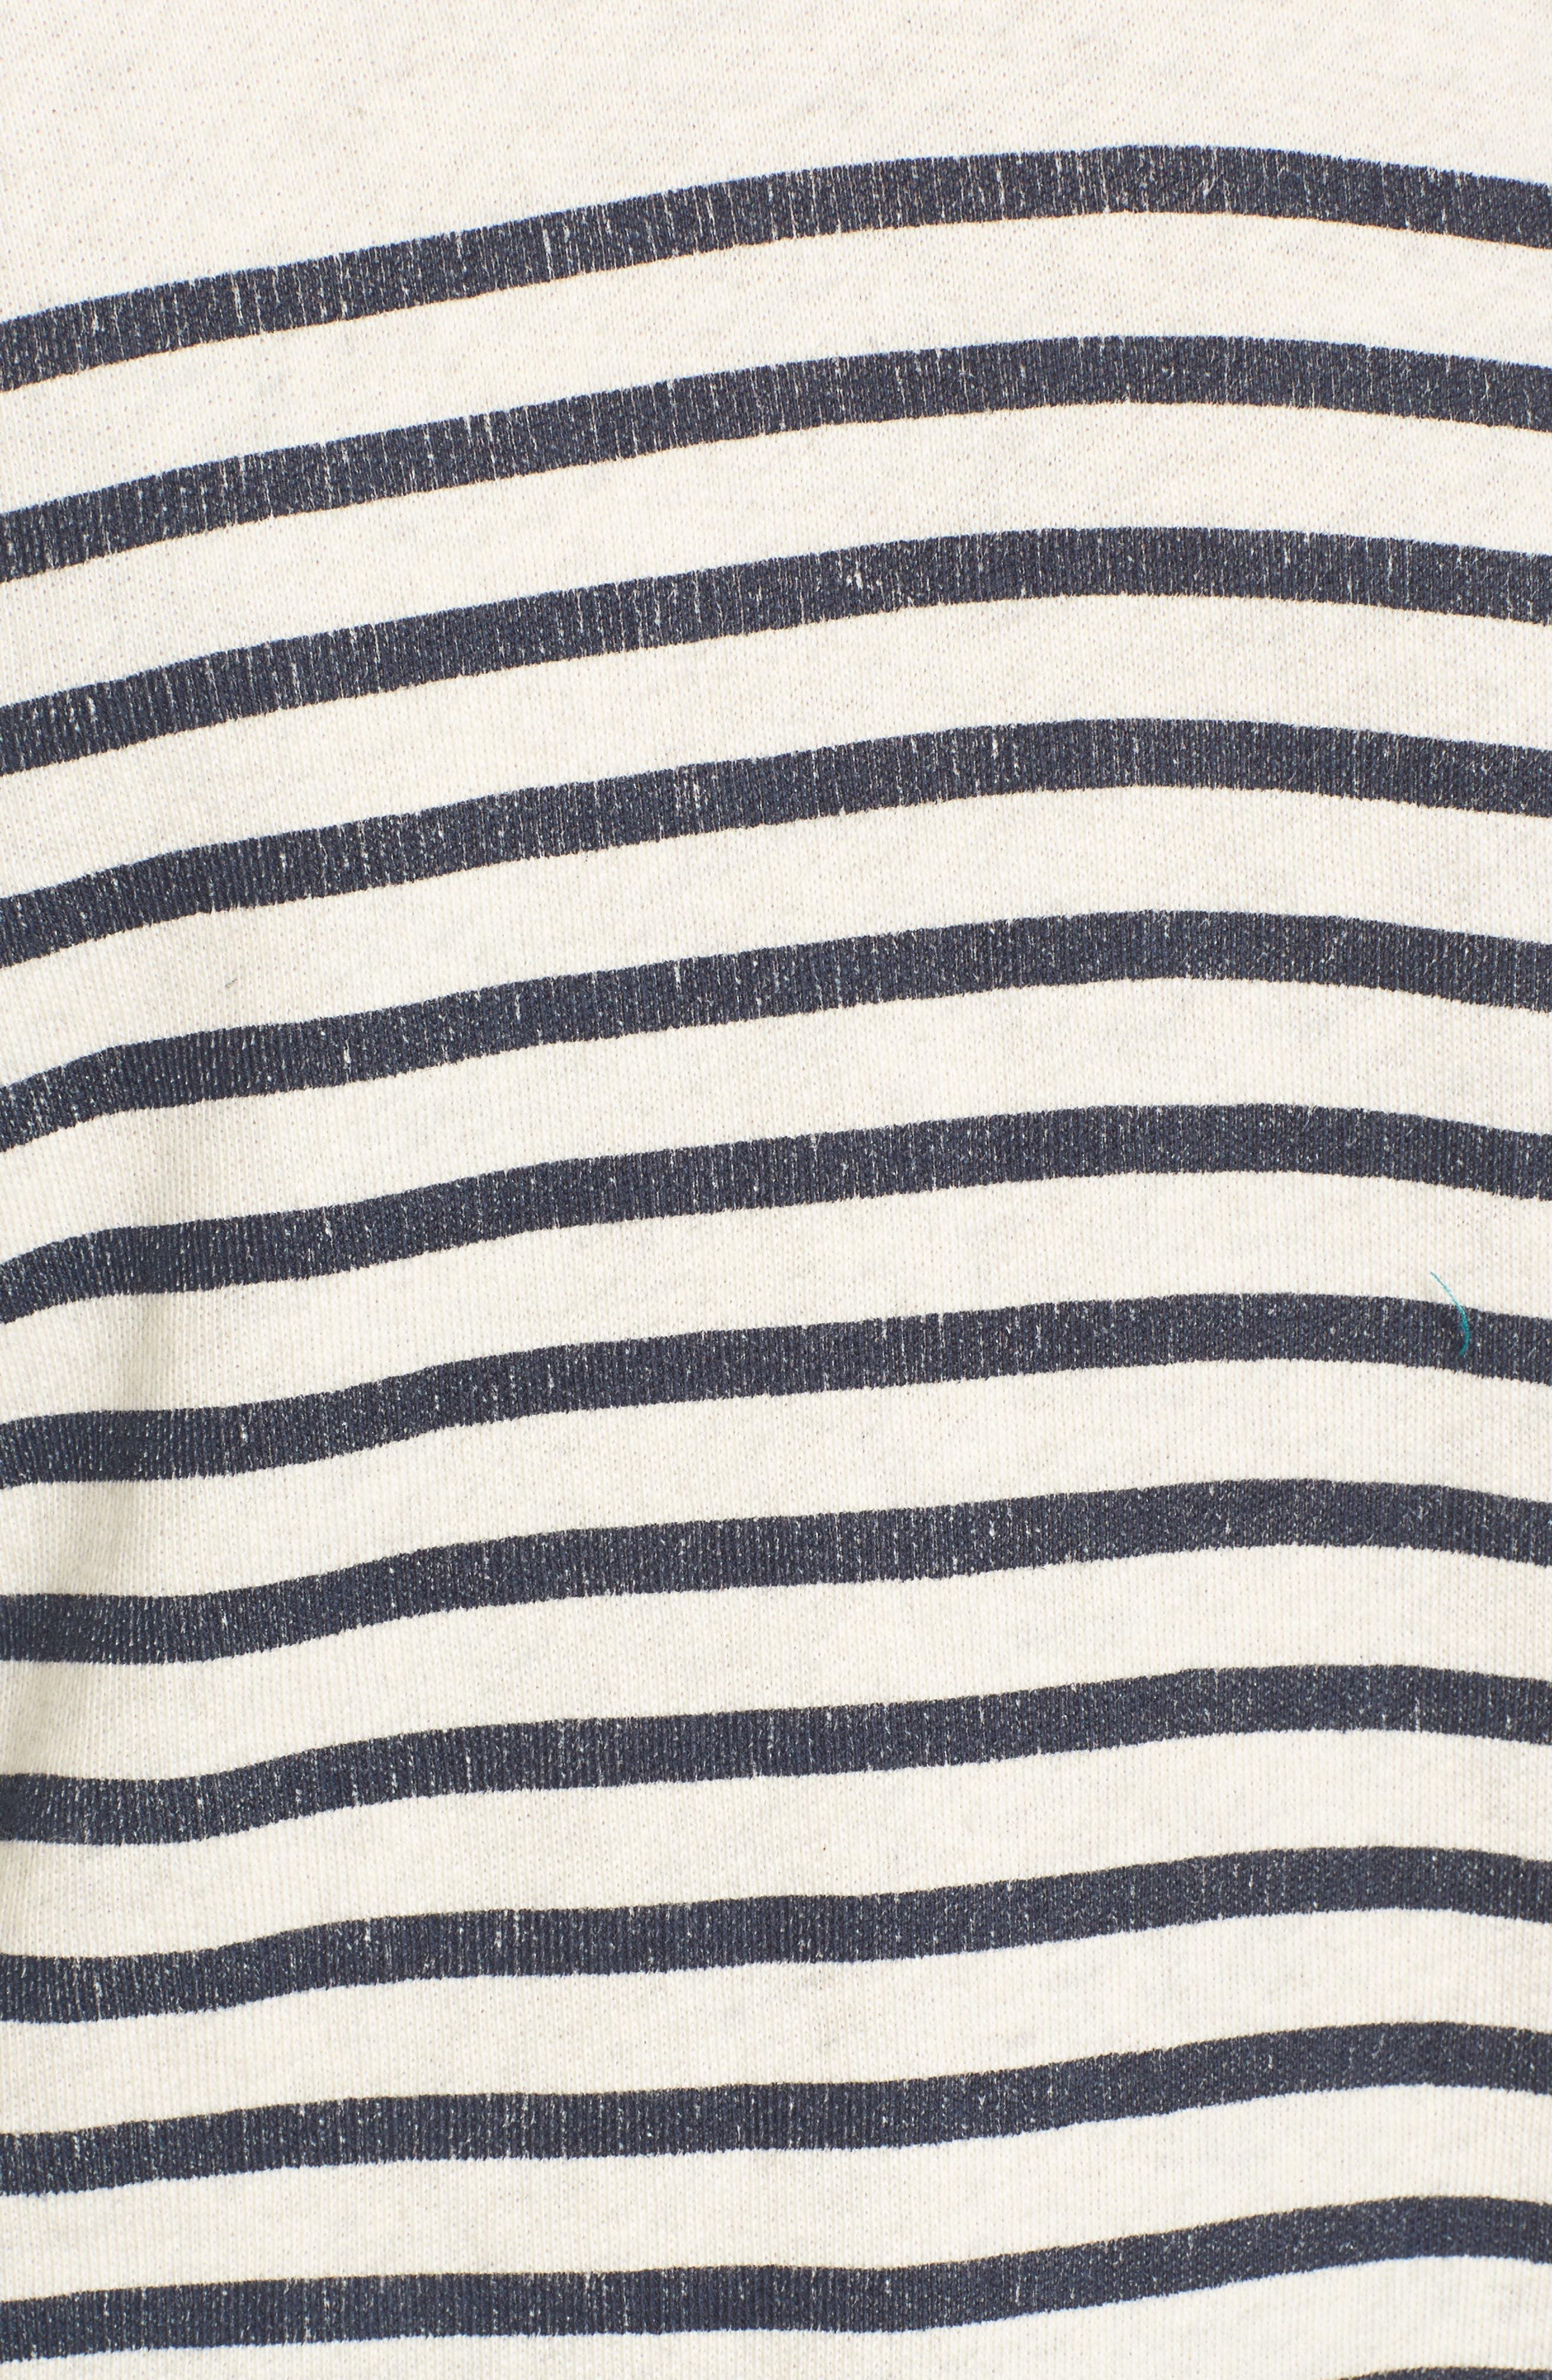 Seabrook Stripe Sweatshirt,                             Alternate thumbnail 5, color,                             909